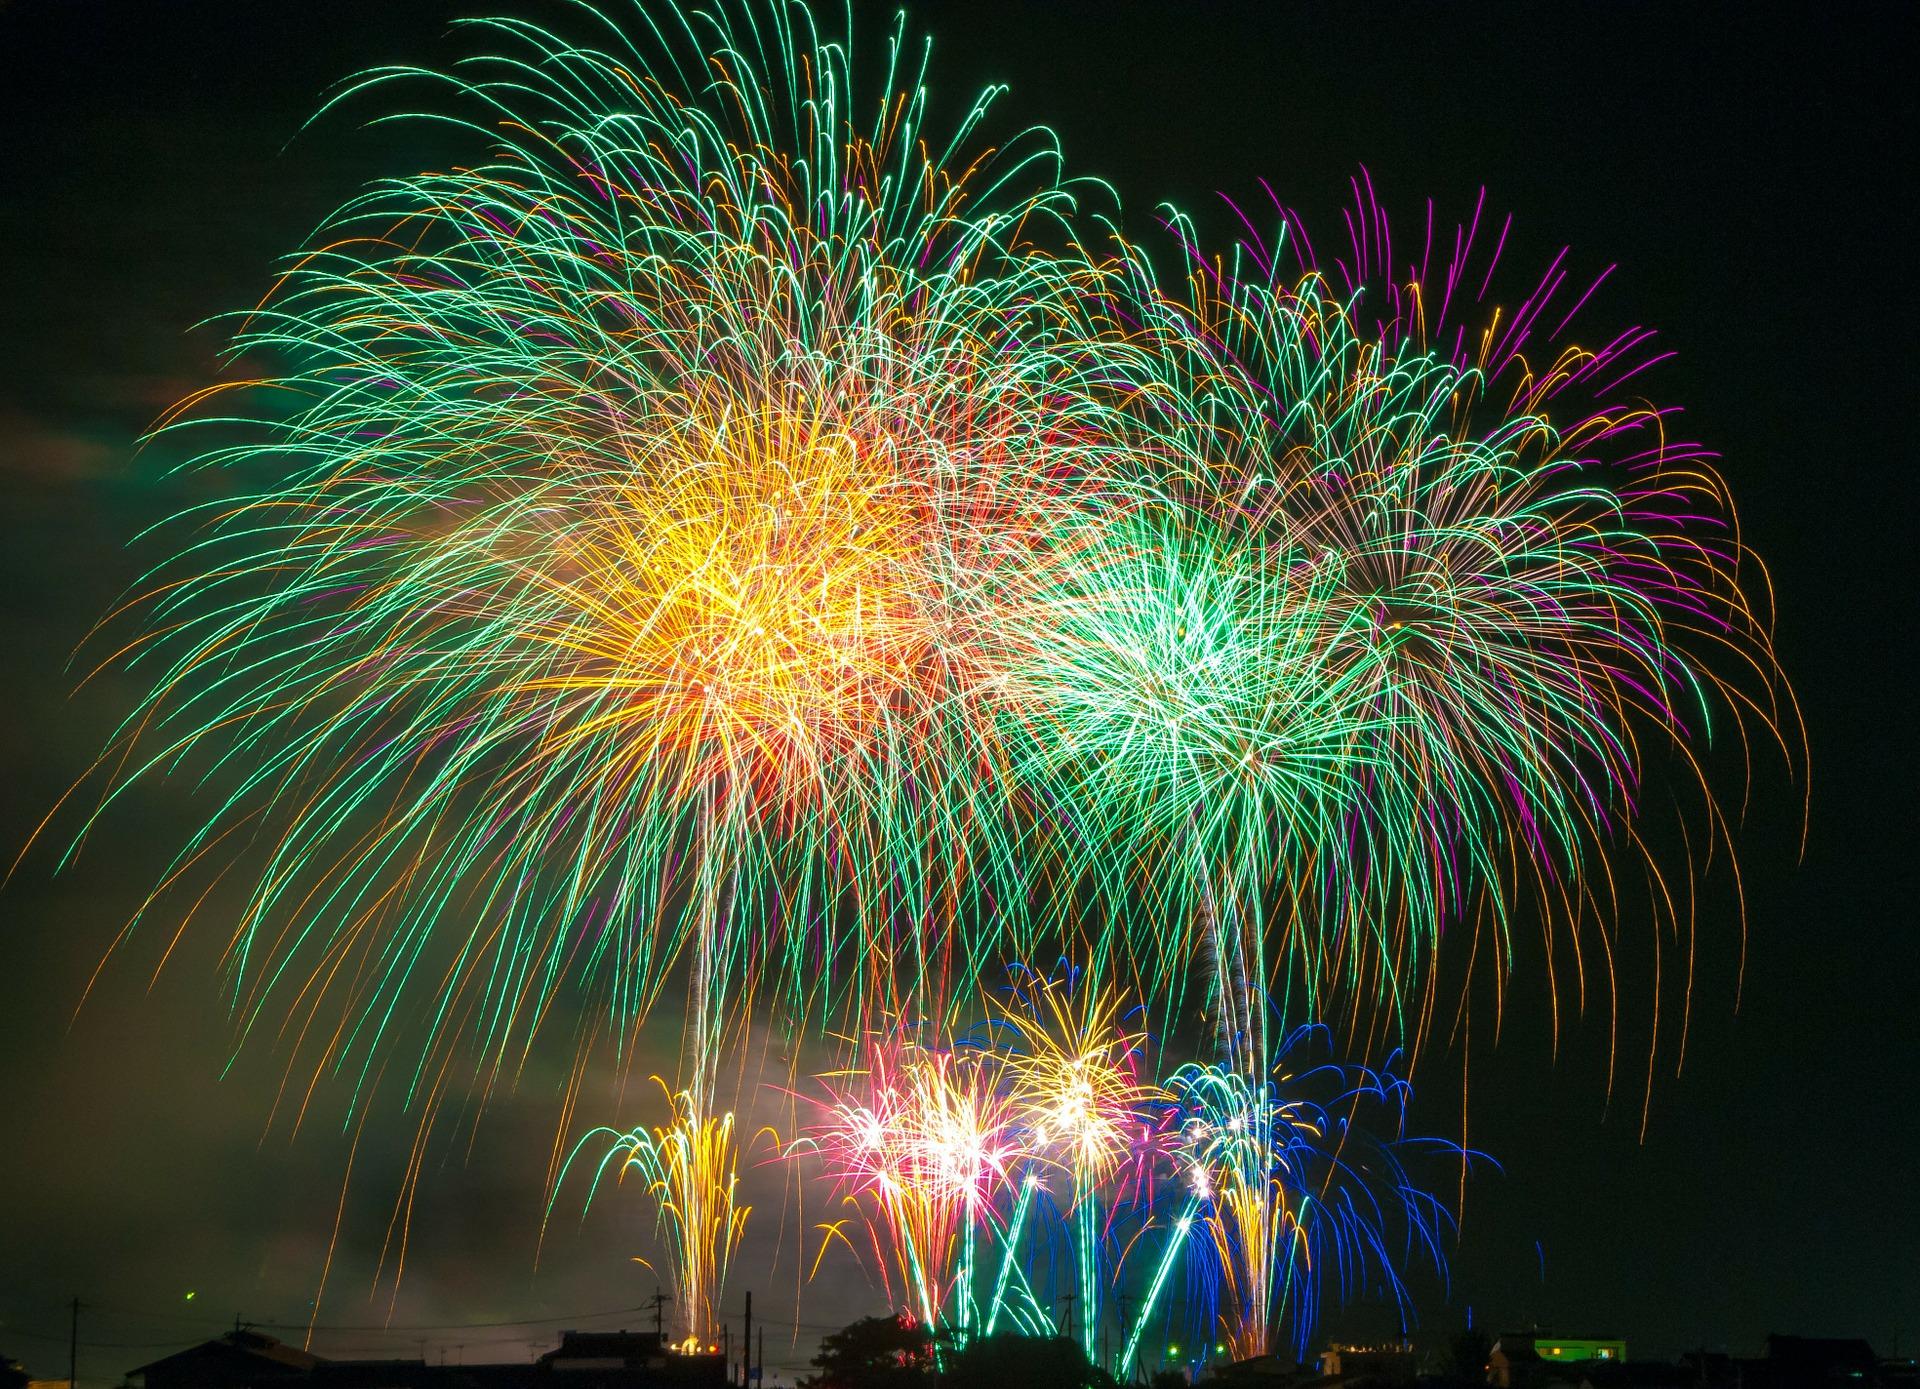 fireworks-180553_1920.jpg